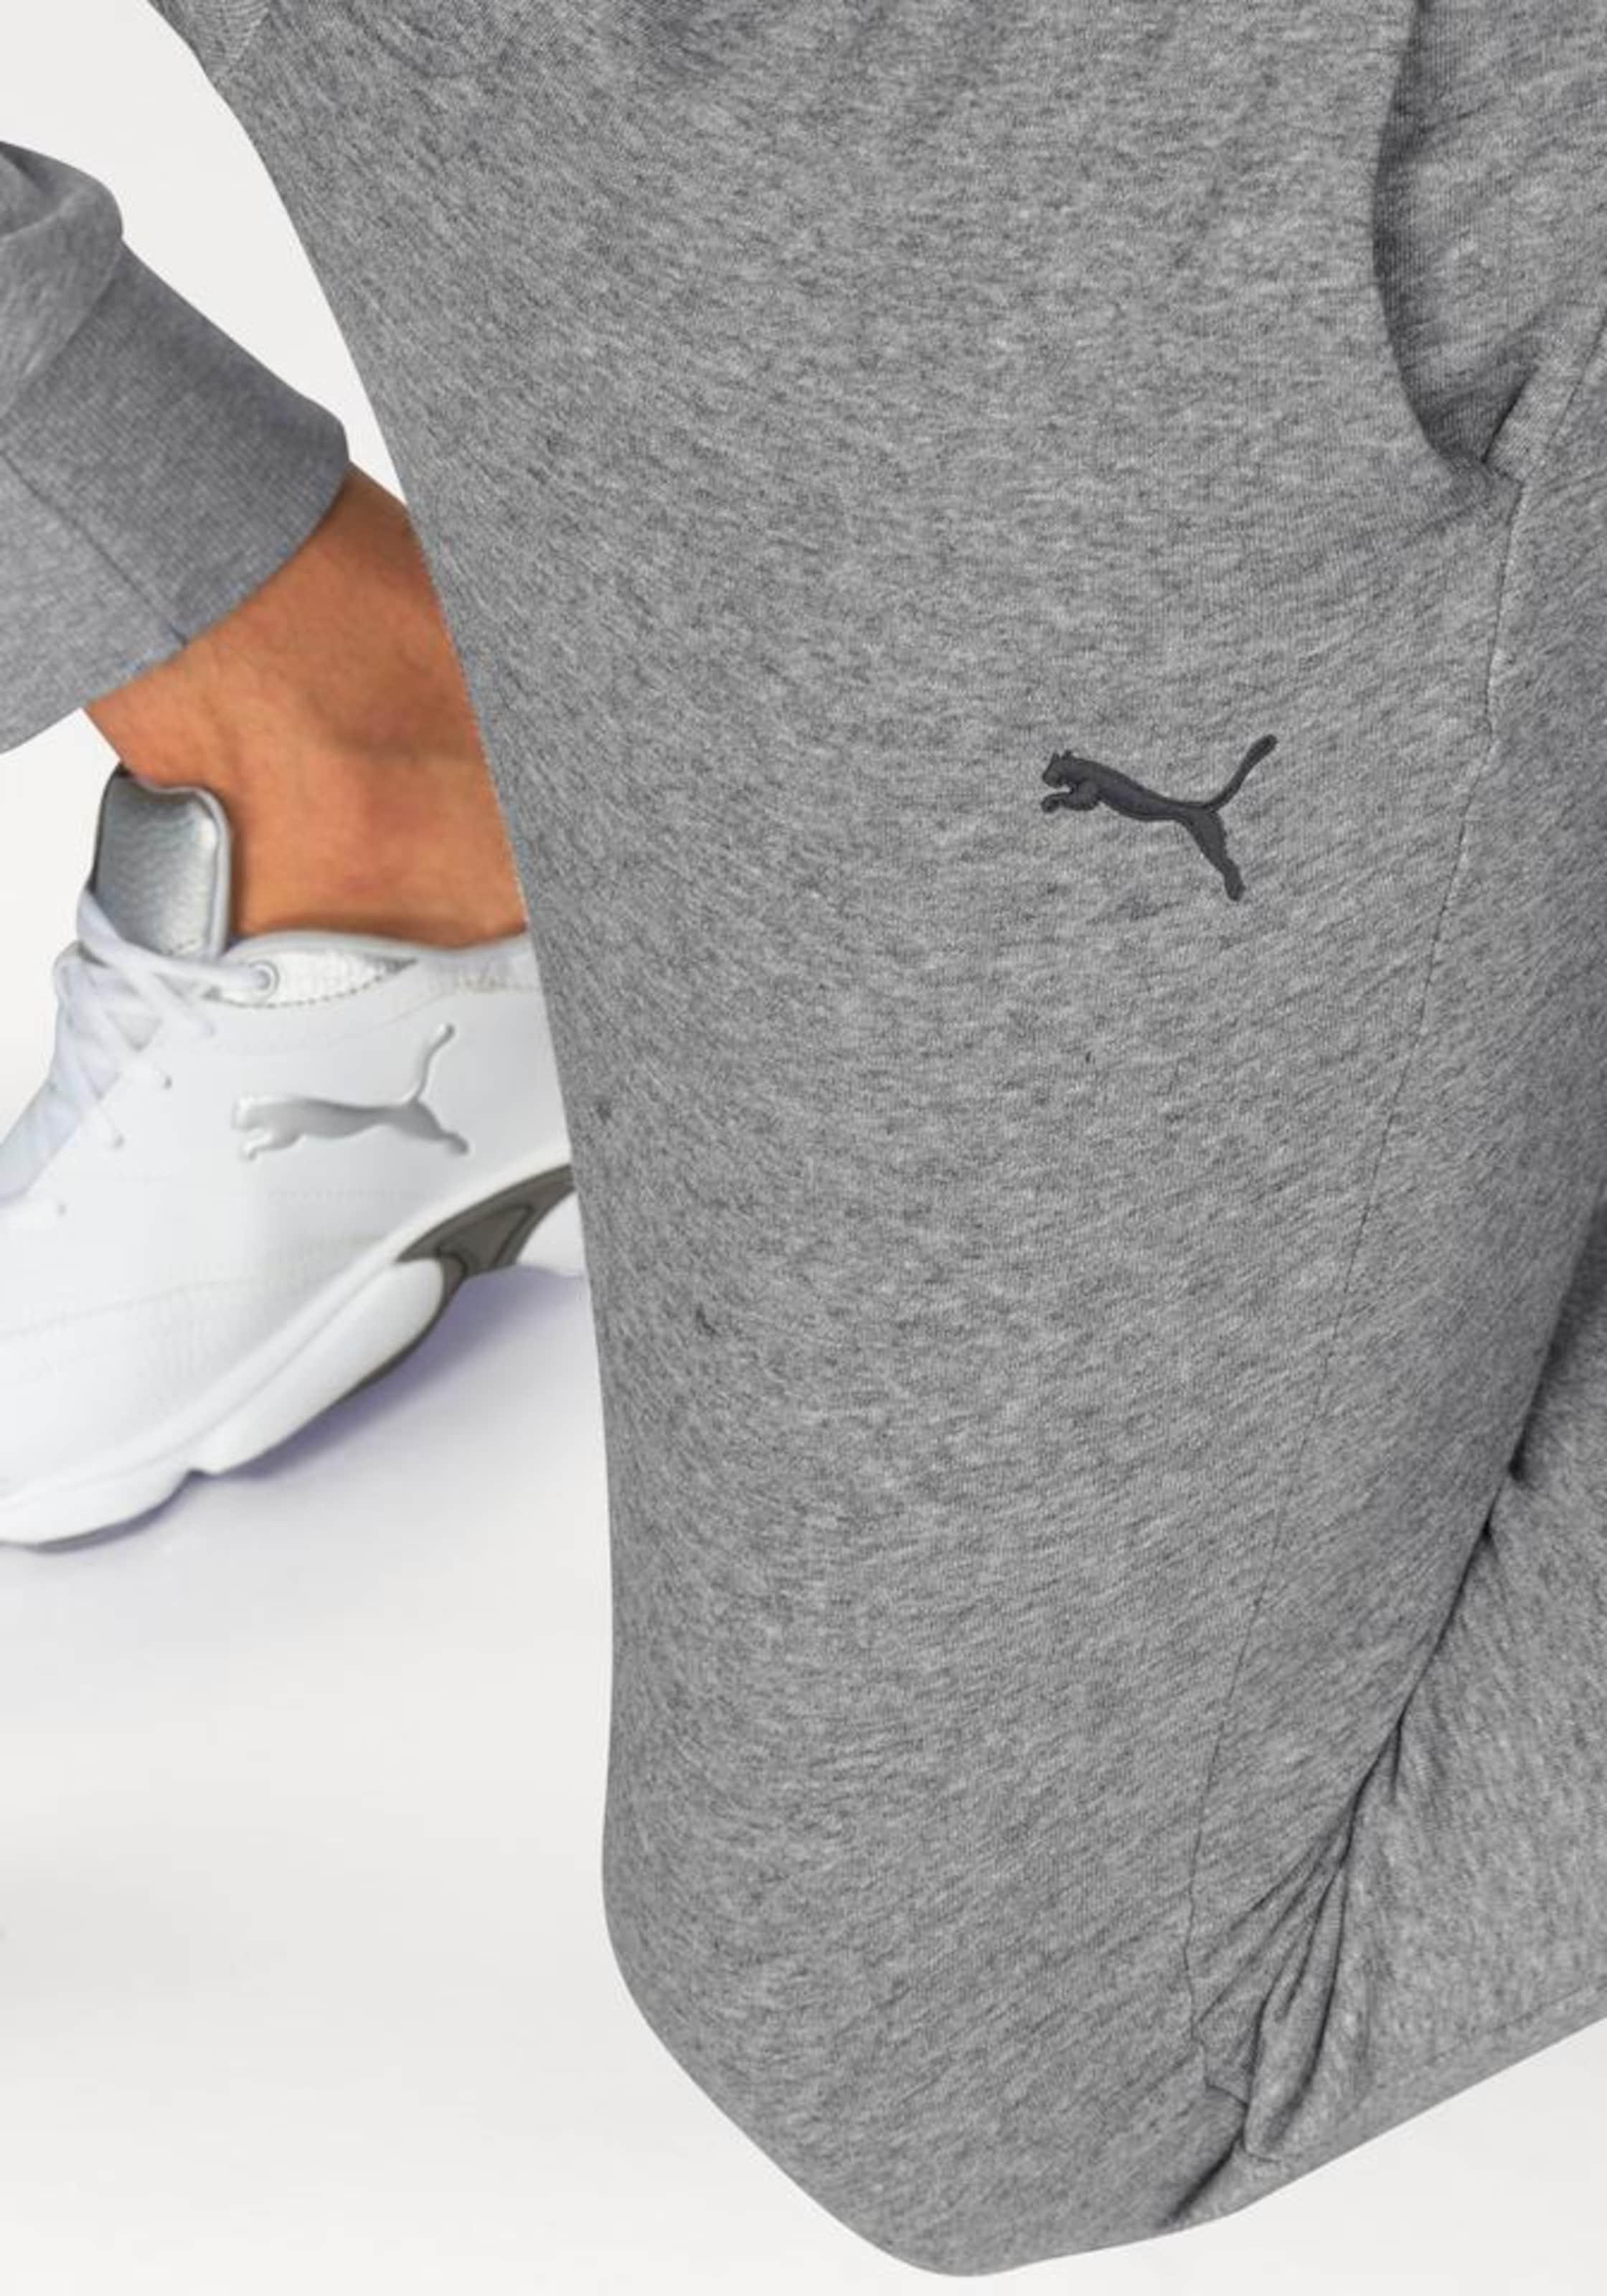 Erkunden PUMA Jogginghose 'ESS Sweat Pants' Beeile Dich Billig Rabatt Authentisch 1YIR7JJKz